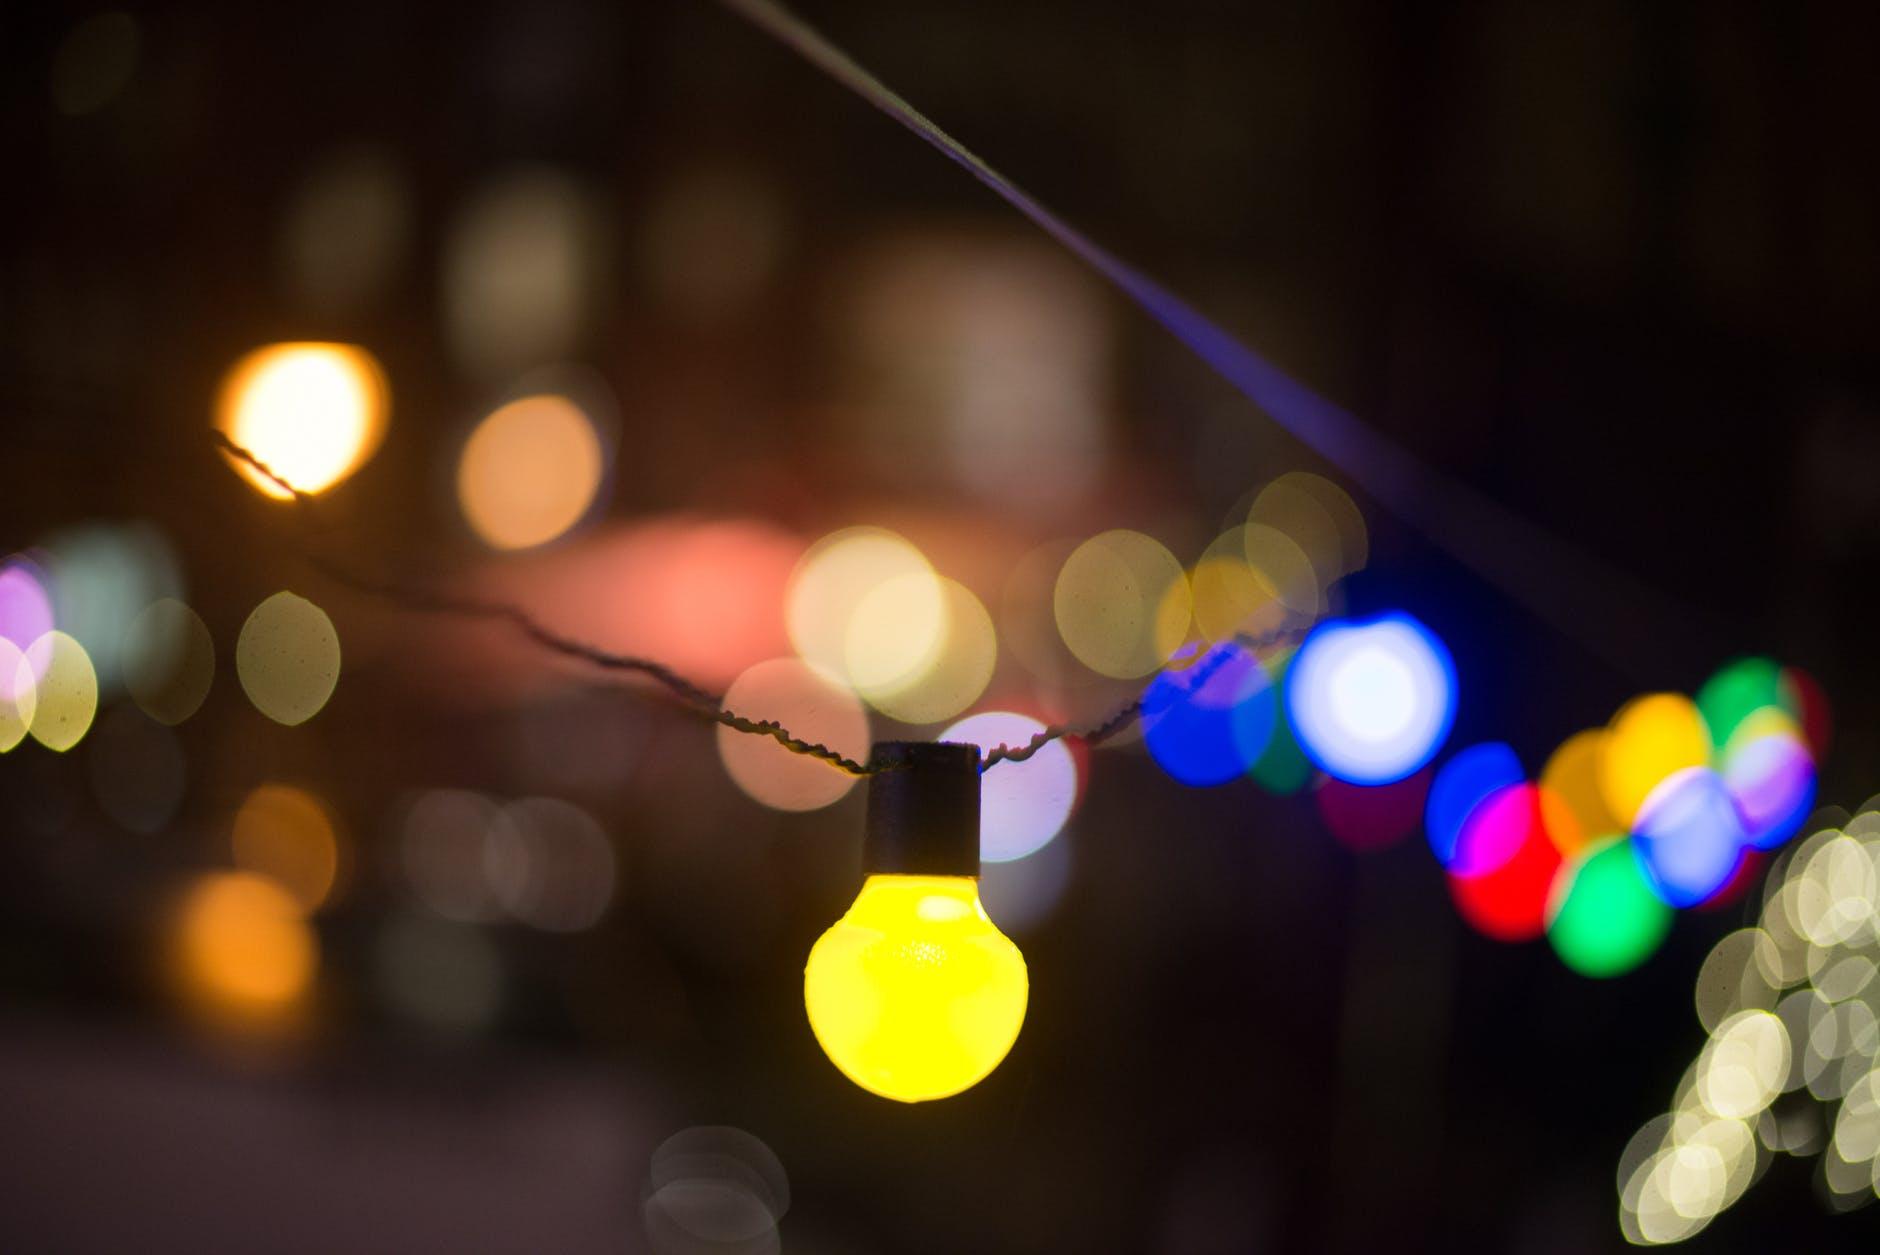 light-bulbs-yellow-lights-332306